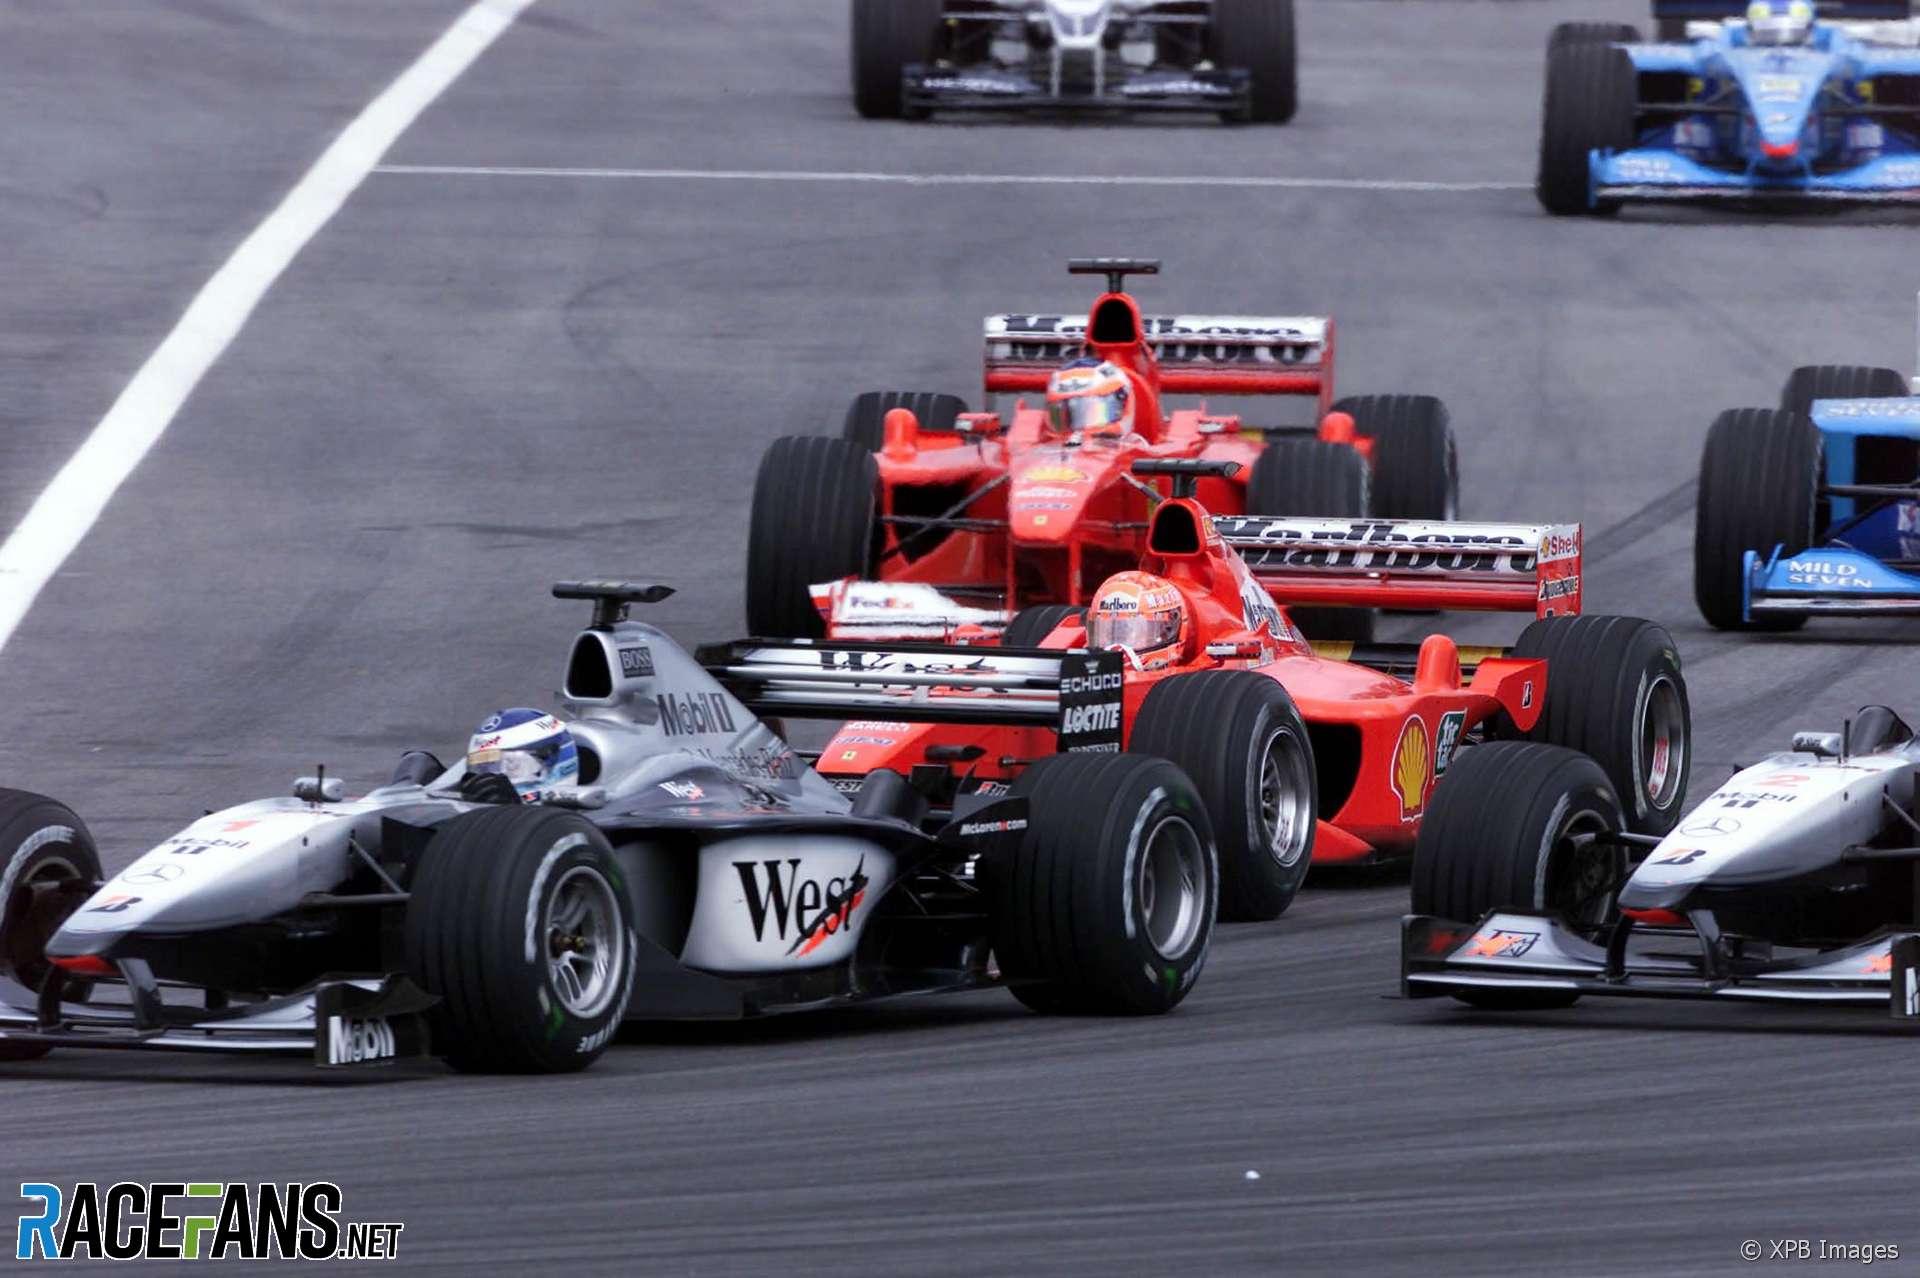 Formel 1 Malaysia 2021 Start